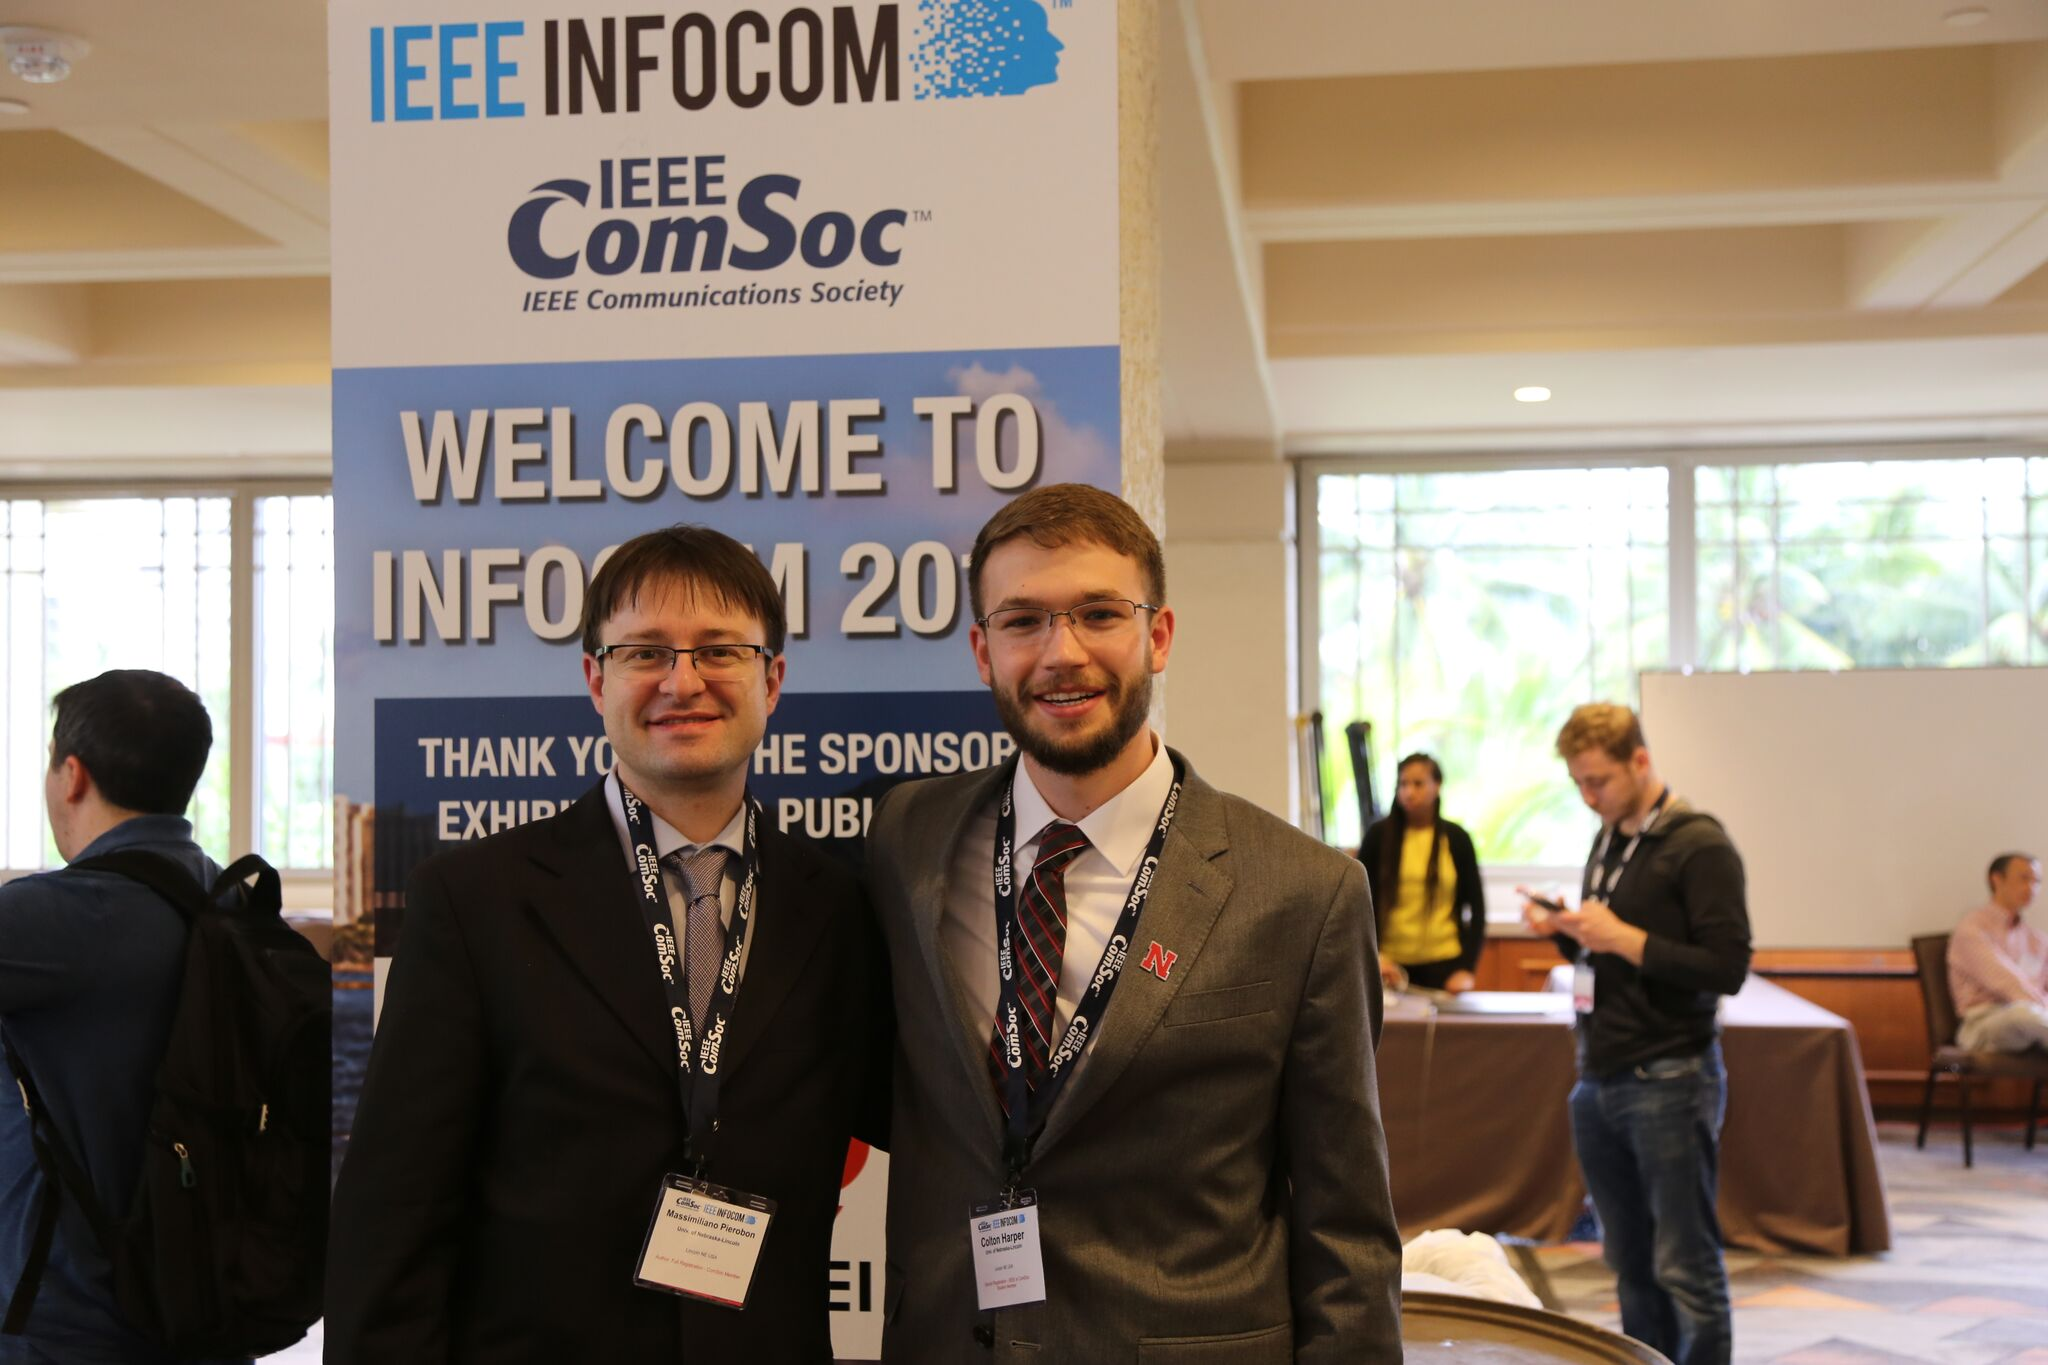 Massimiliano Pierobon and Colton Harper at IEEE INFOCOM 2018.